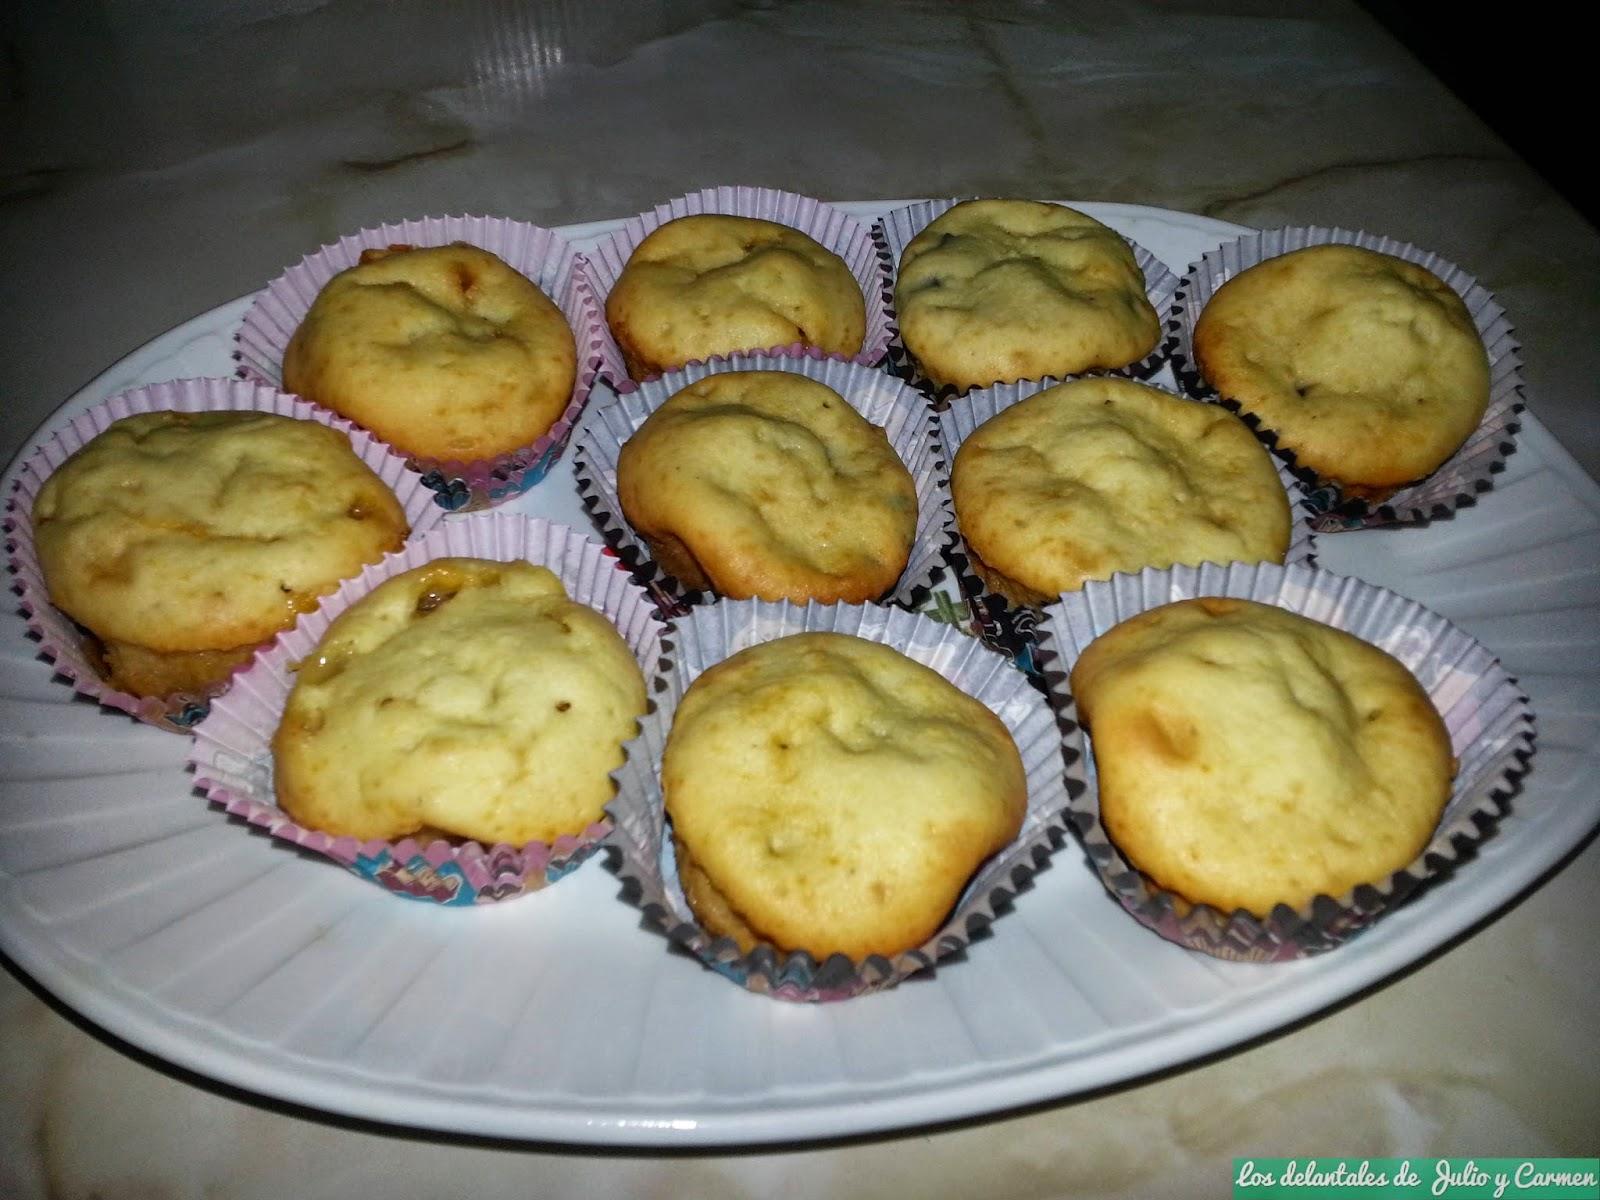 Muffin de choco-blanco y choco-negro